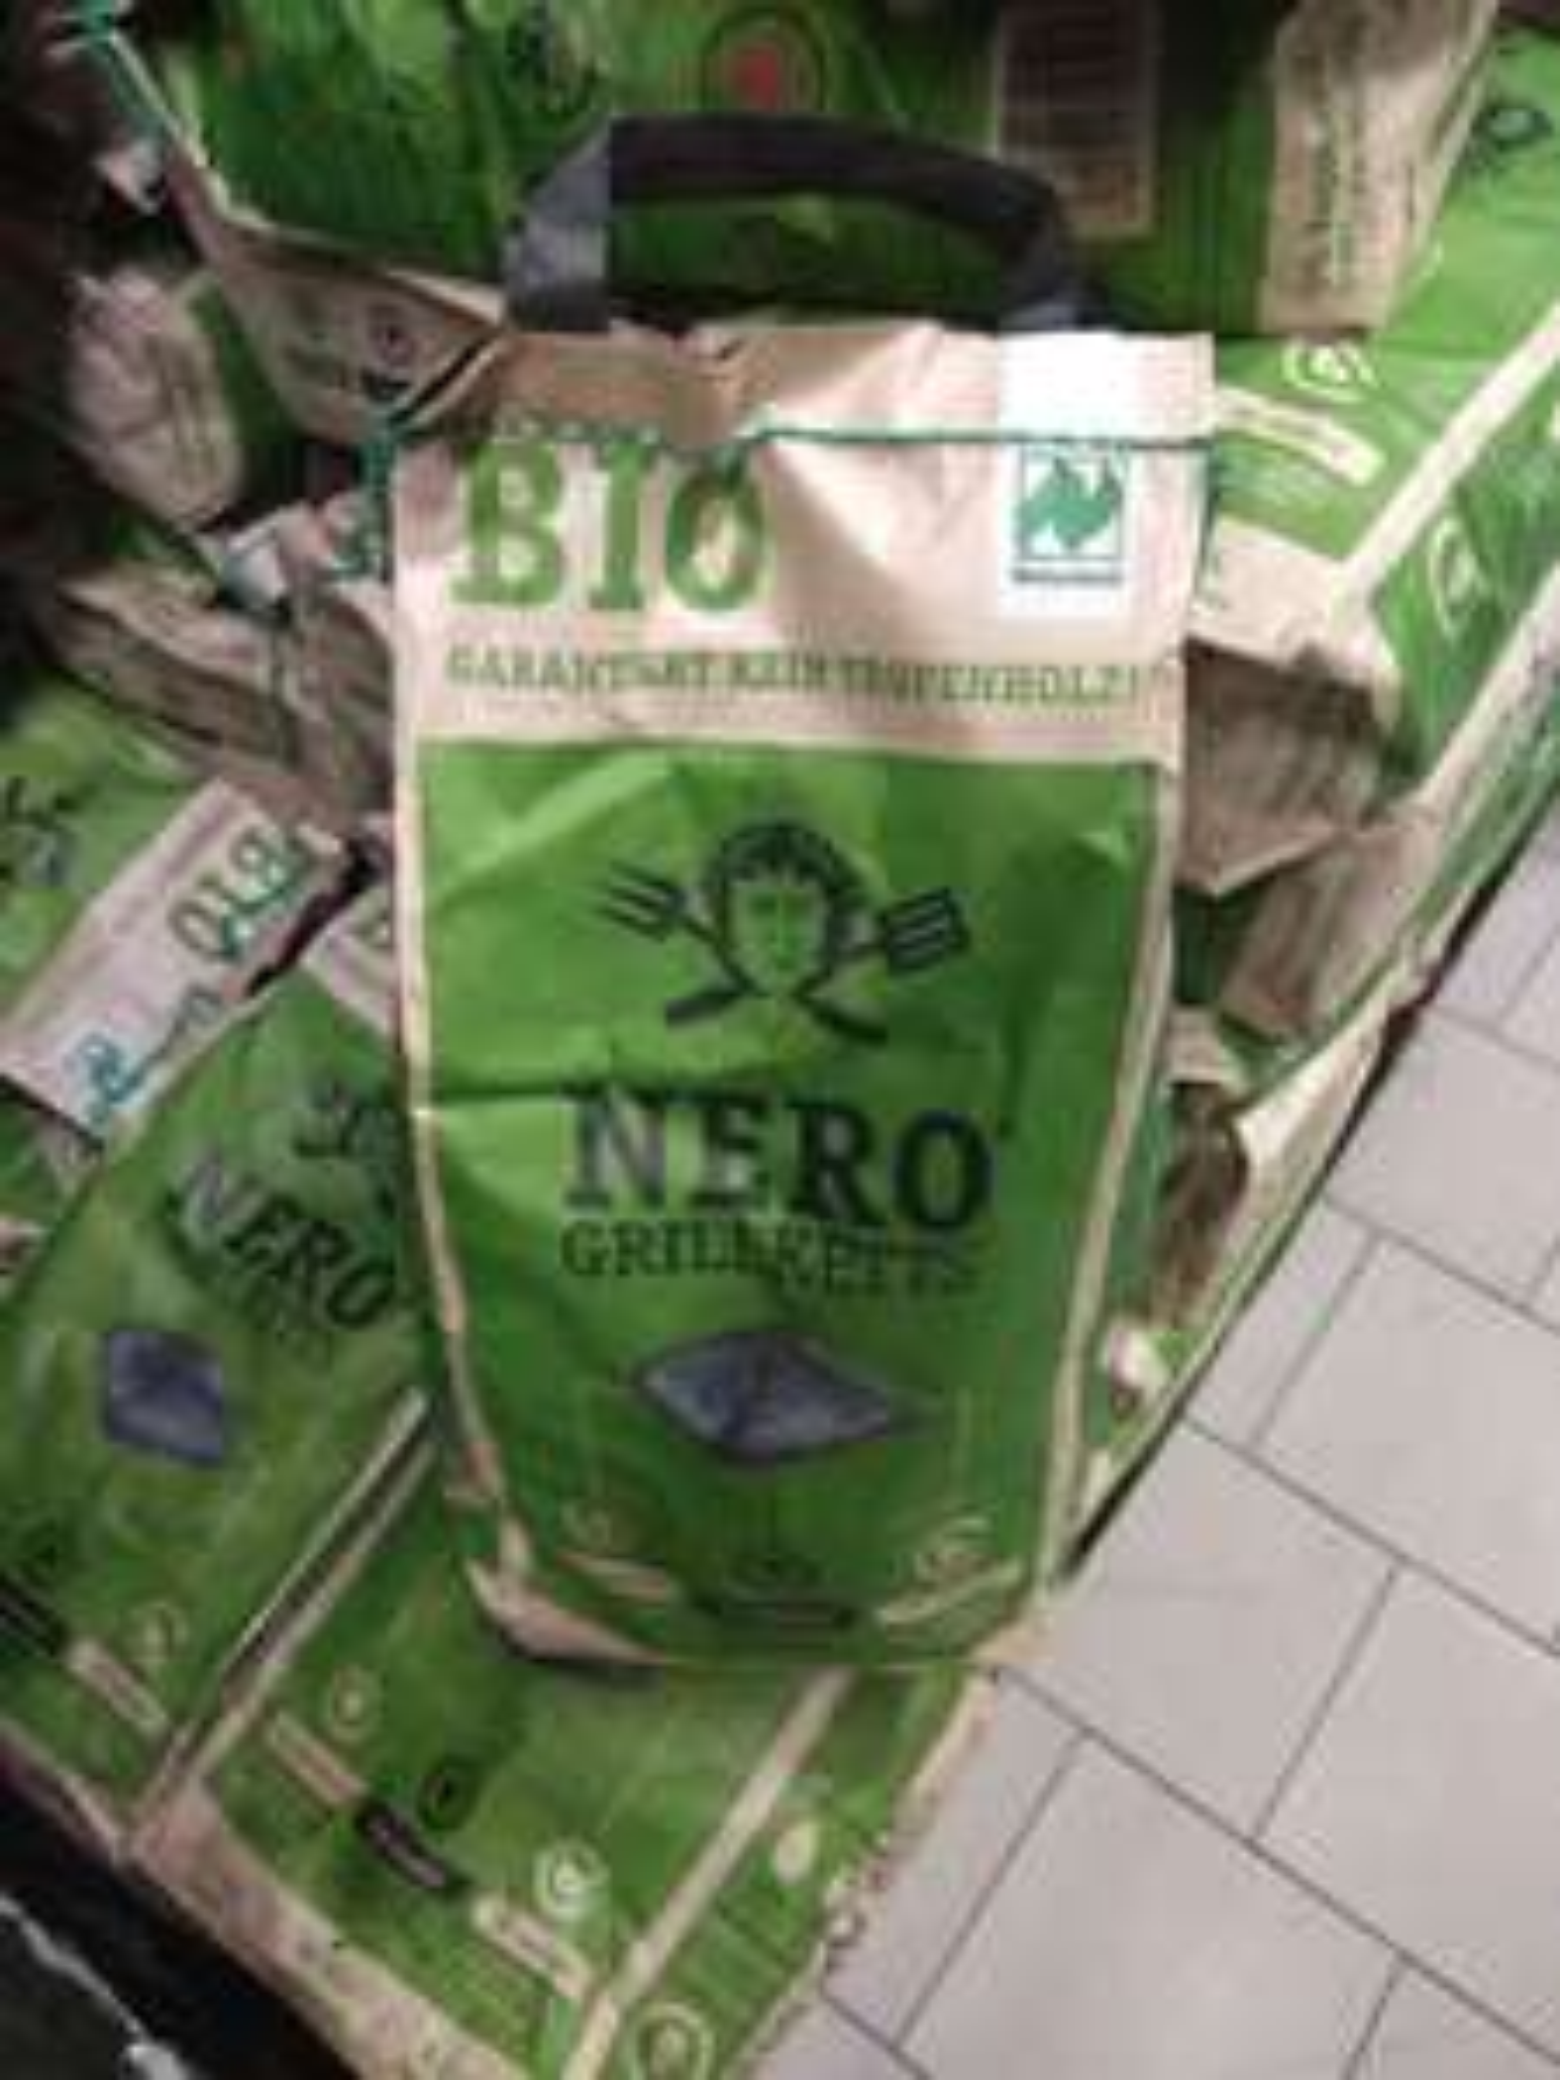 [Kaufland] Nero Bio Grillbriketts 2.5kg